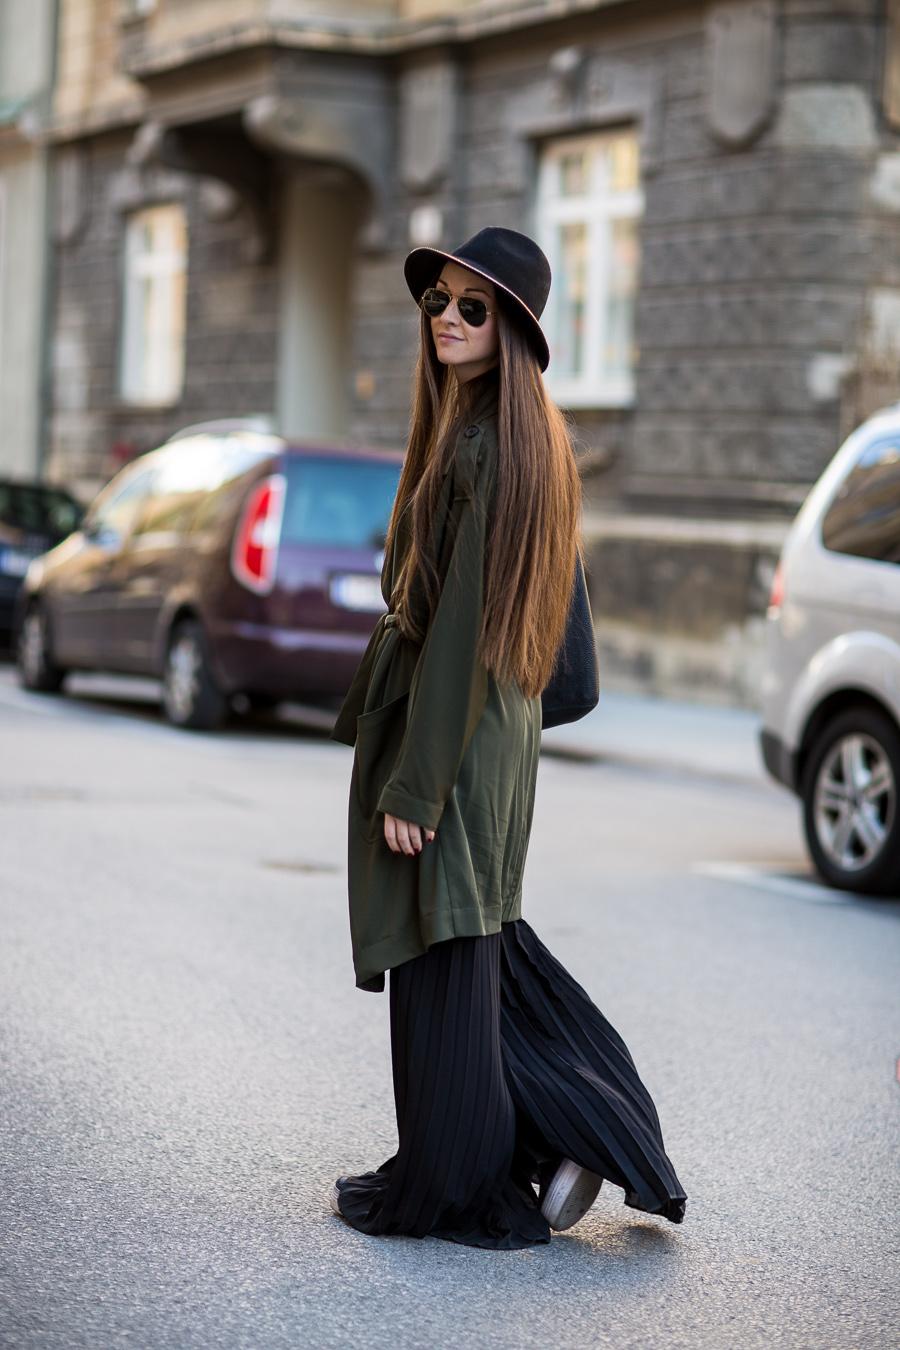 street-style-fashion-blog-innsbruck-vintage-markt-8.jpg